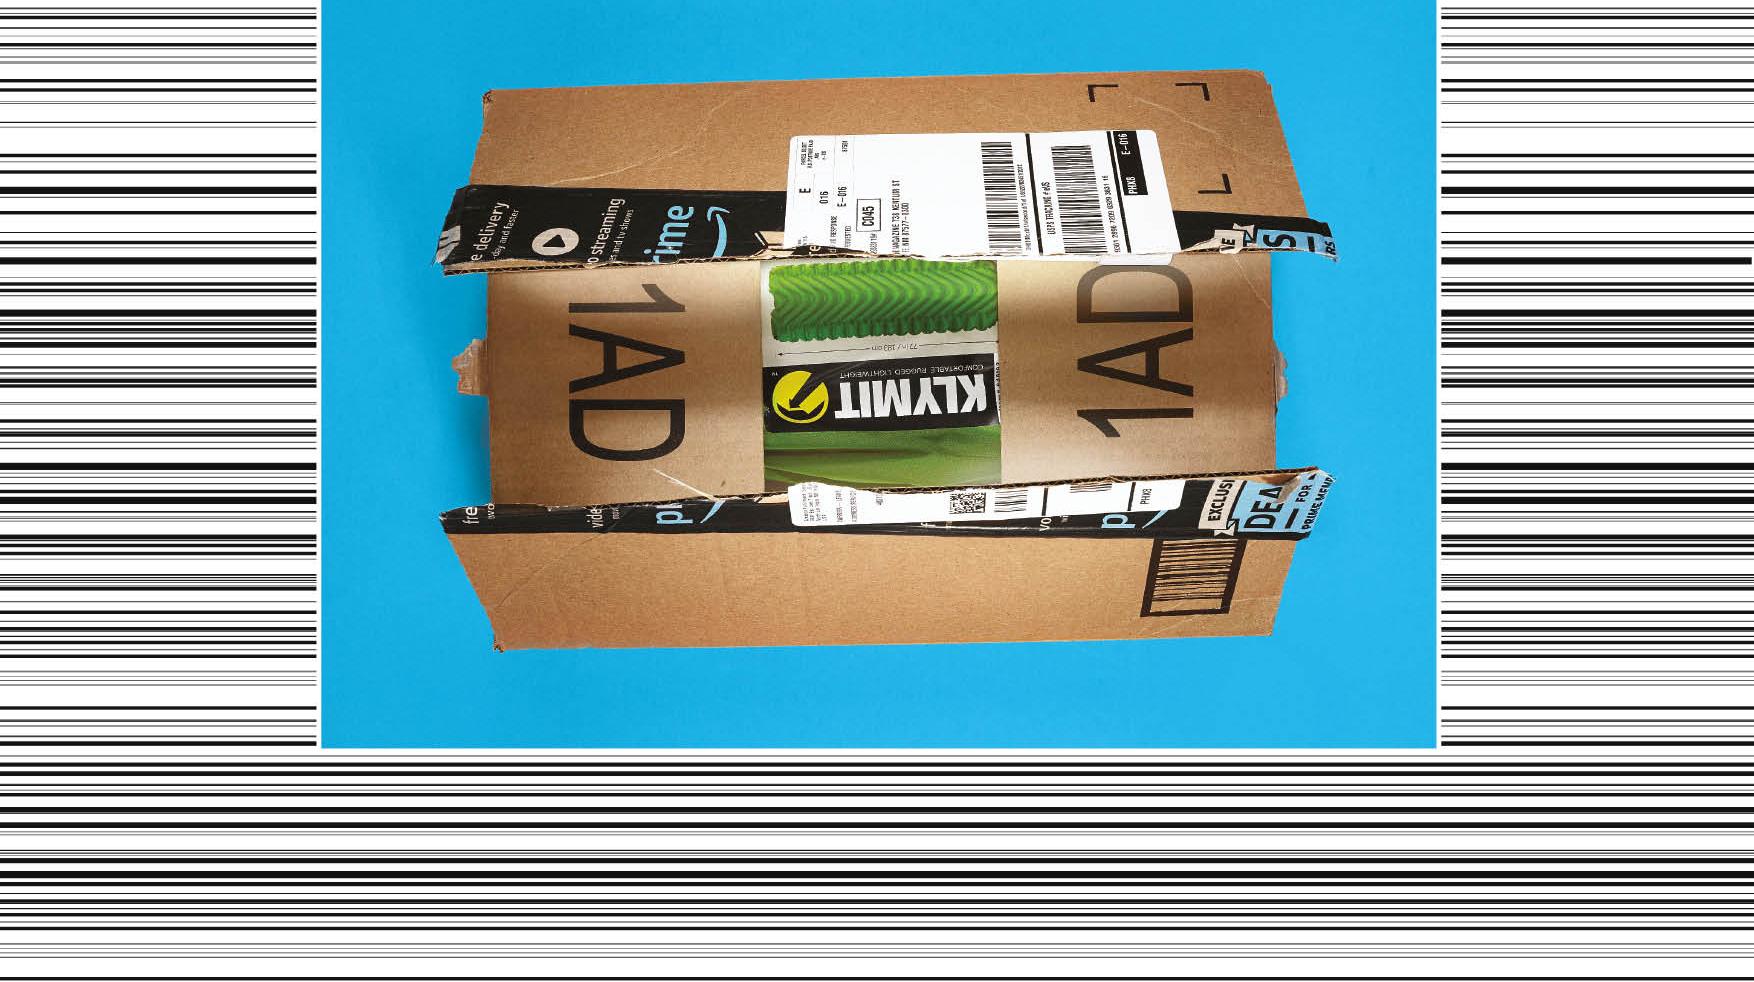 Carton de livraison Amazon